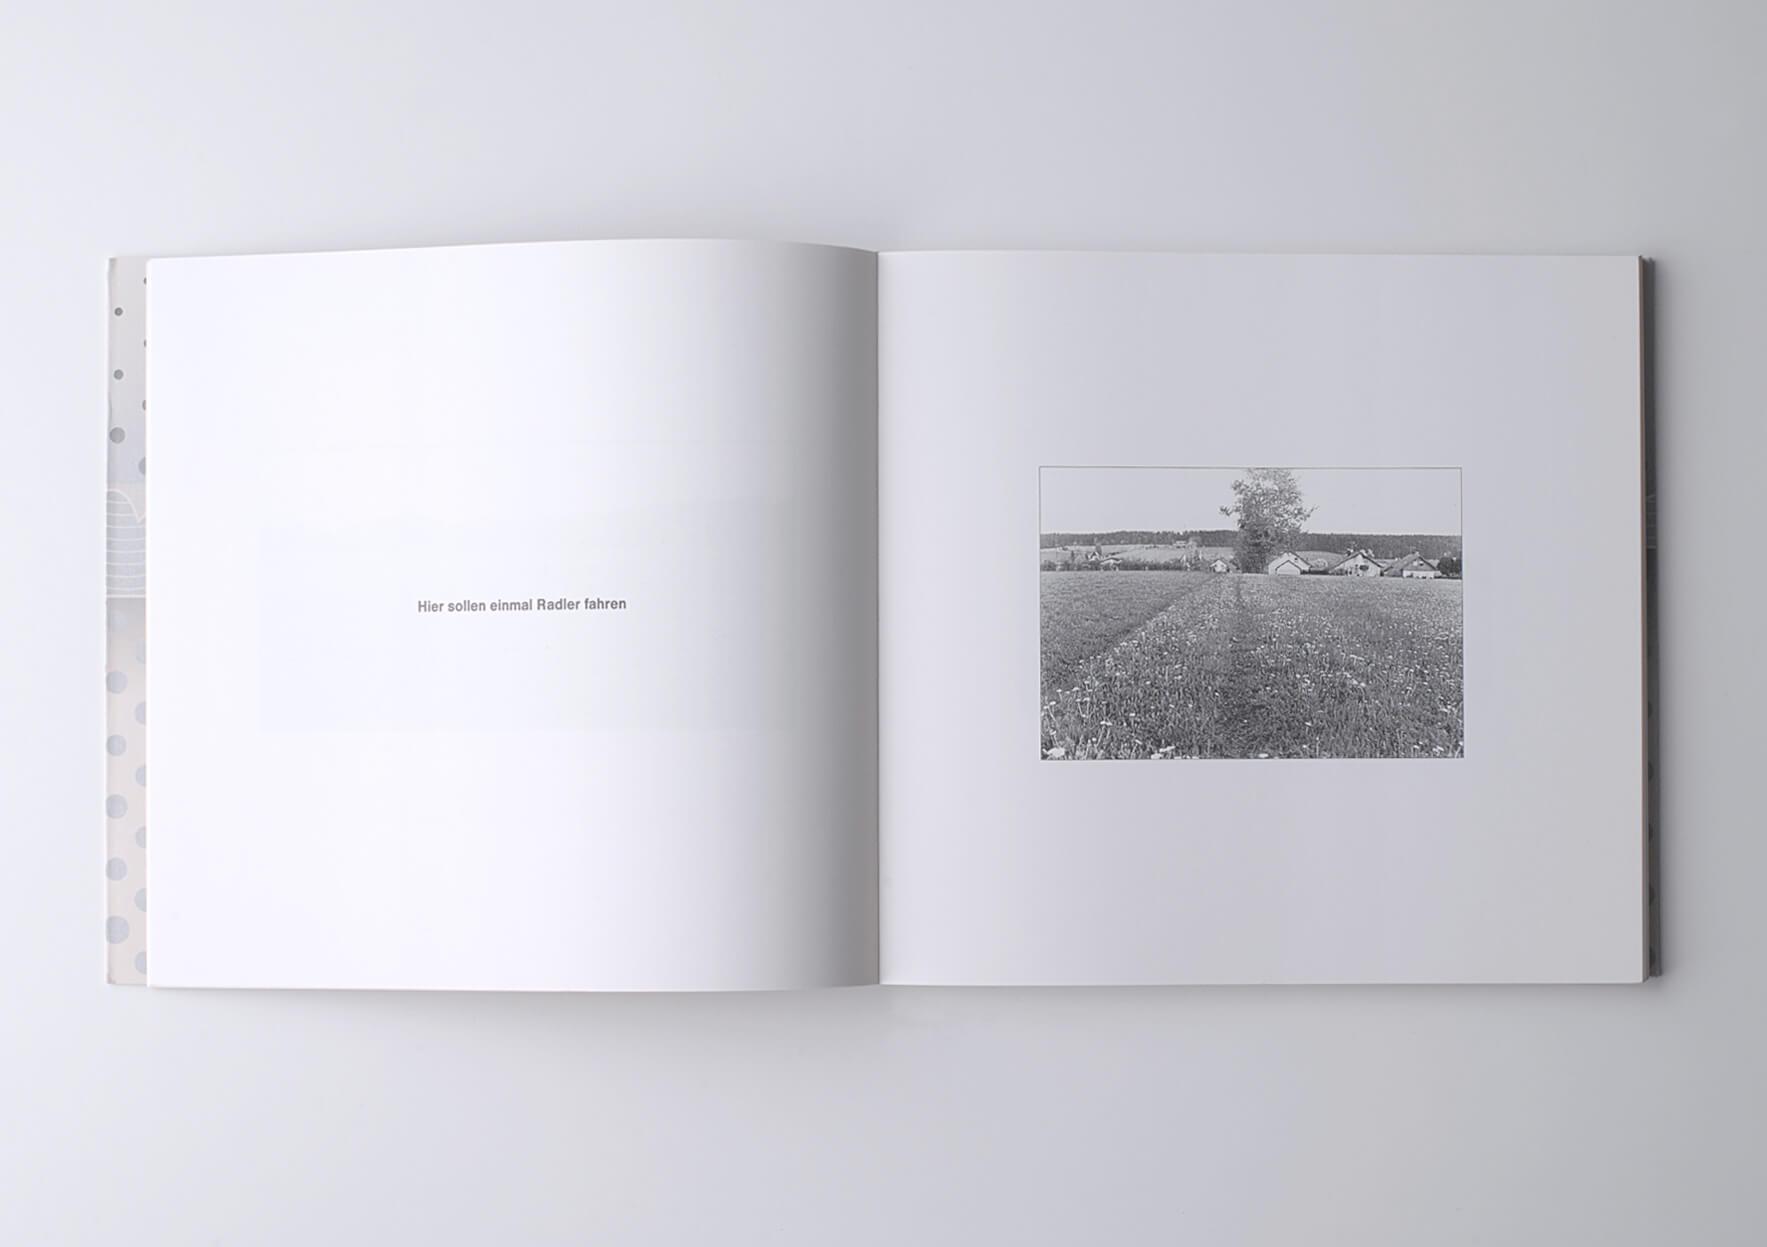 PETER PILLER. Noch ist nichts zu sehen, 1998   Accrochage #3: Footnote nº 10   ProjecteSD